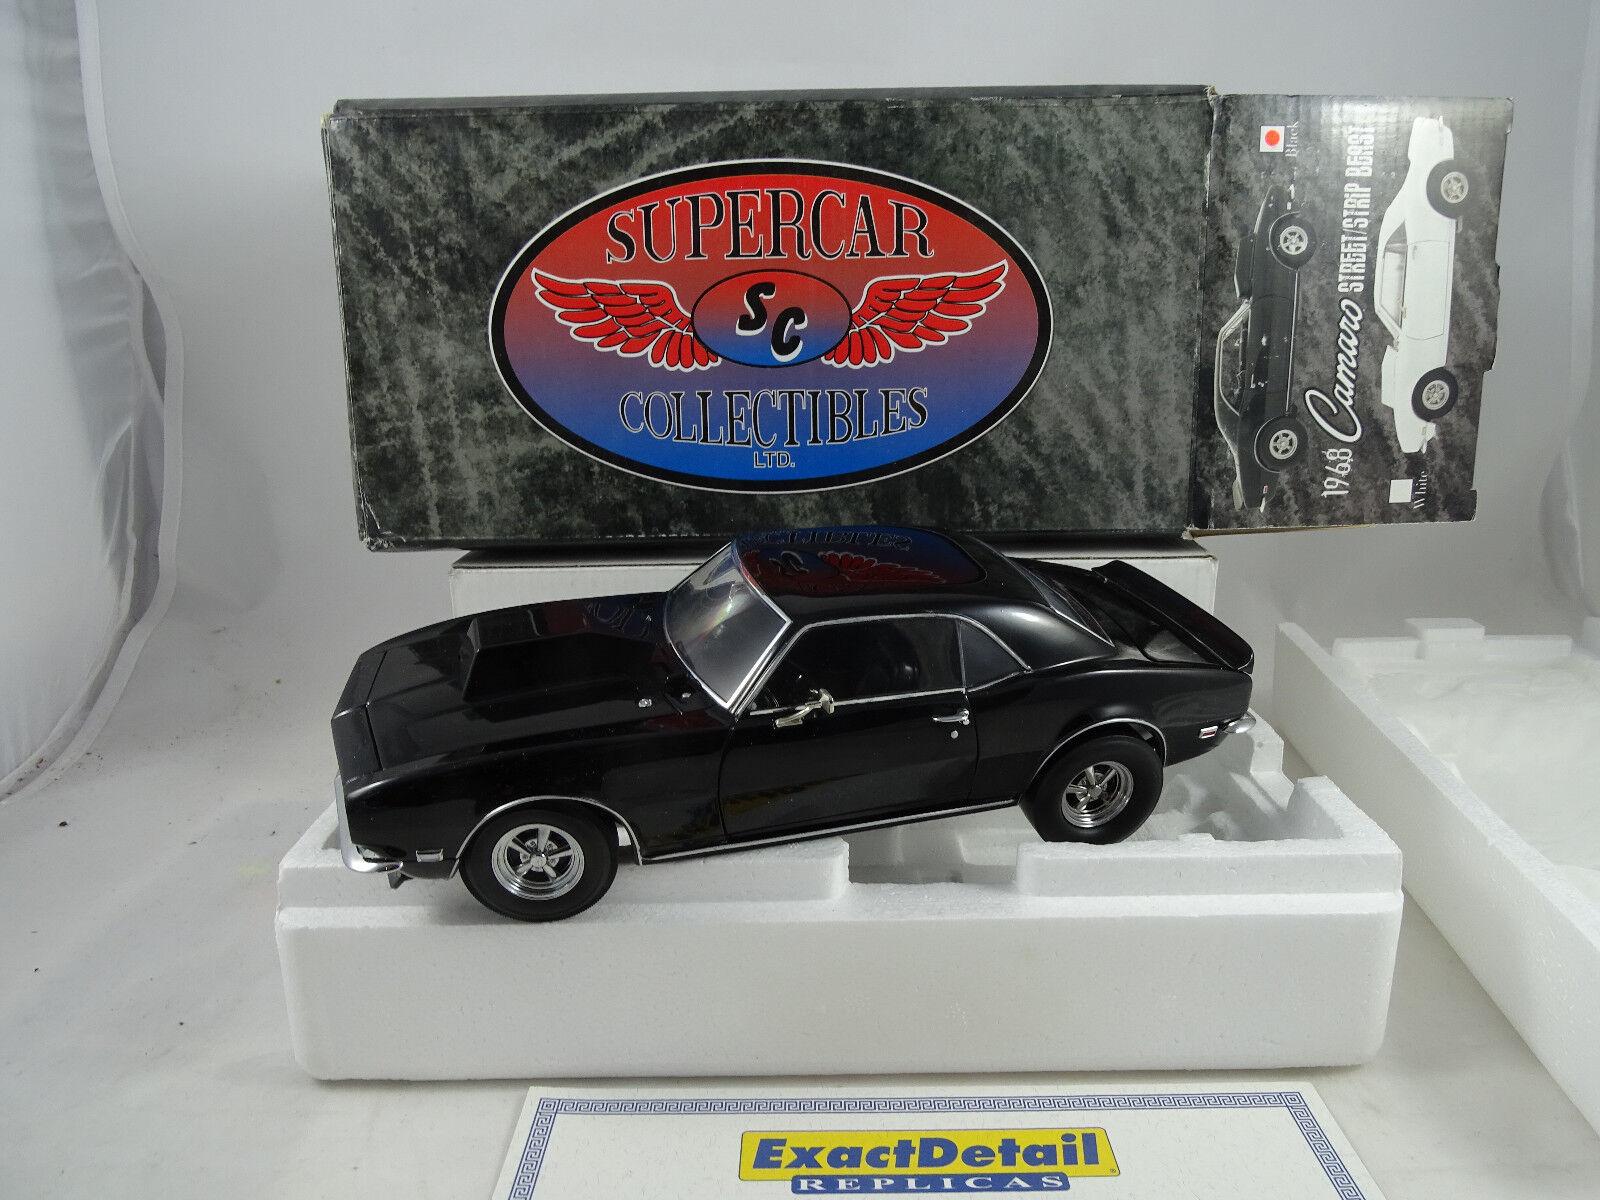 1:18 Esatto Dettaglio 229 Supercar 1968 Camaro Street/Striscia Bestia Nero